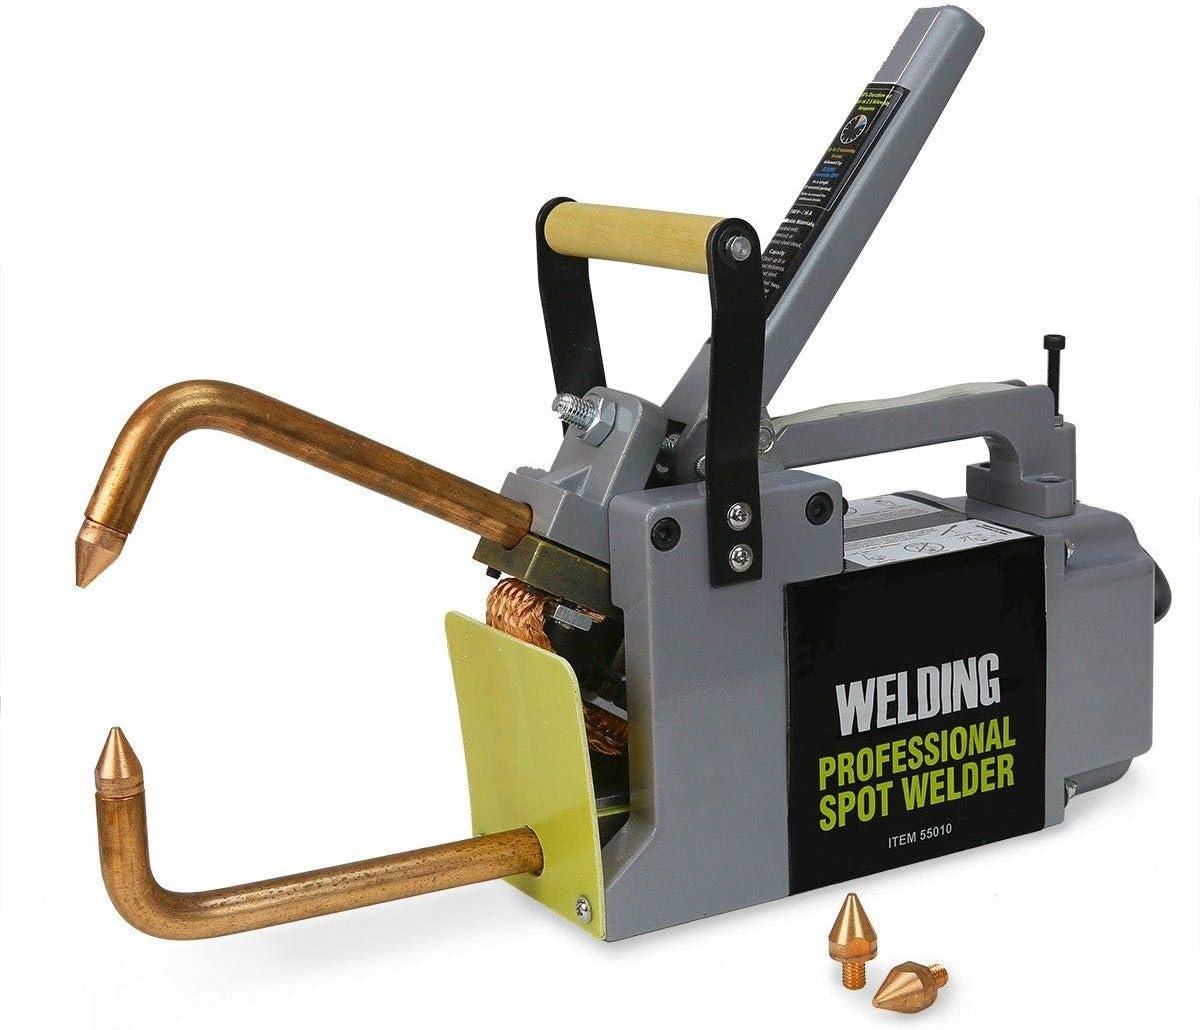 Stark Professional Portable Electric 240 Volt Spot Welder Machine Welding Systems Diy Welding Tips With Handle Amazon Com